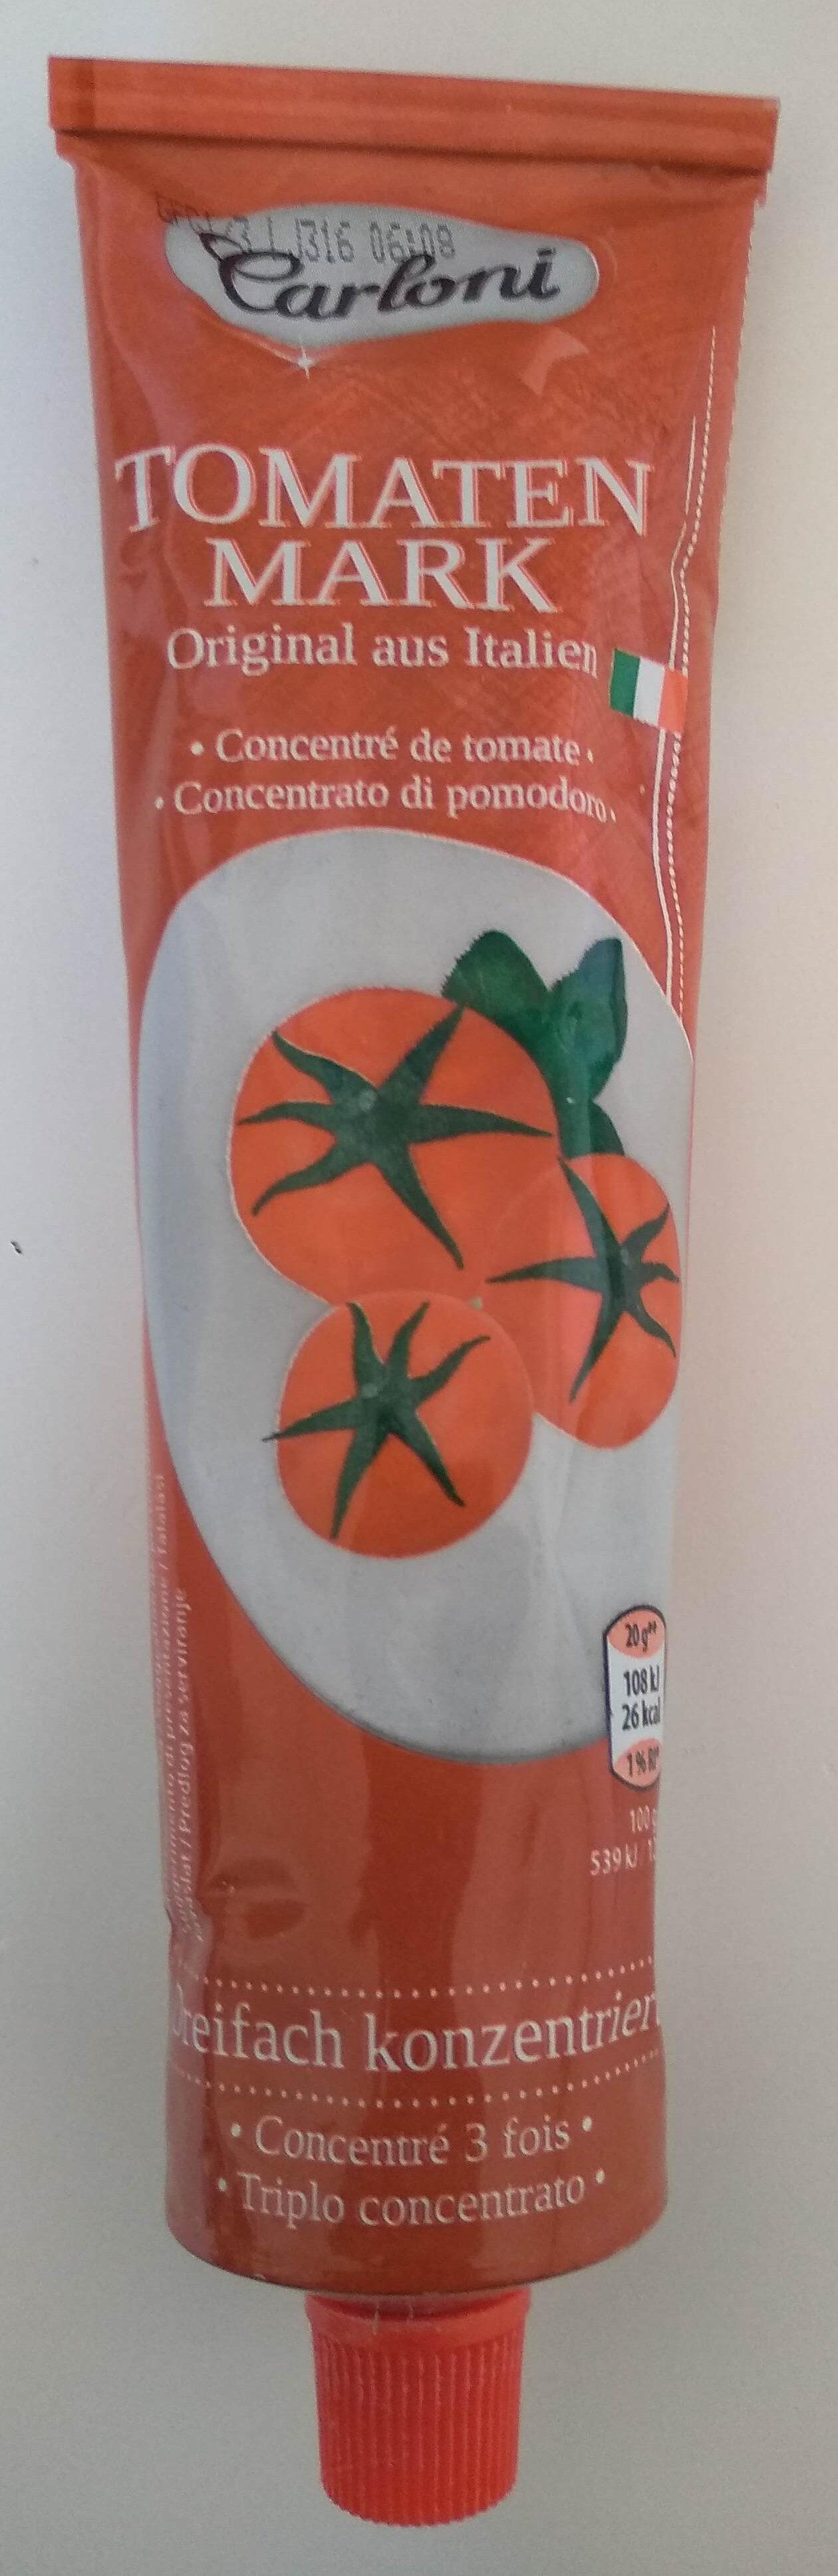 Tomaten mark - Producto - en